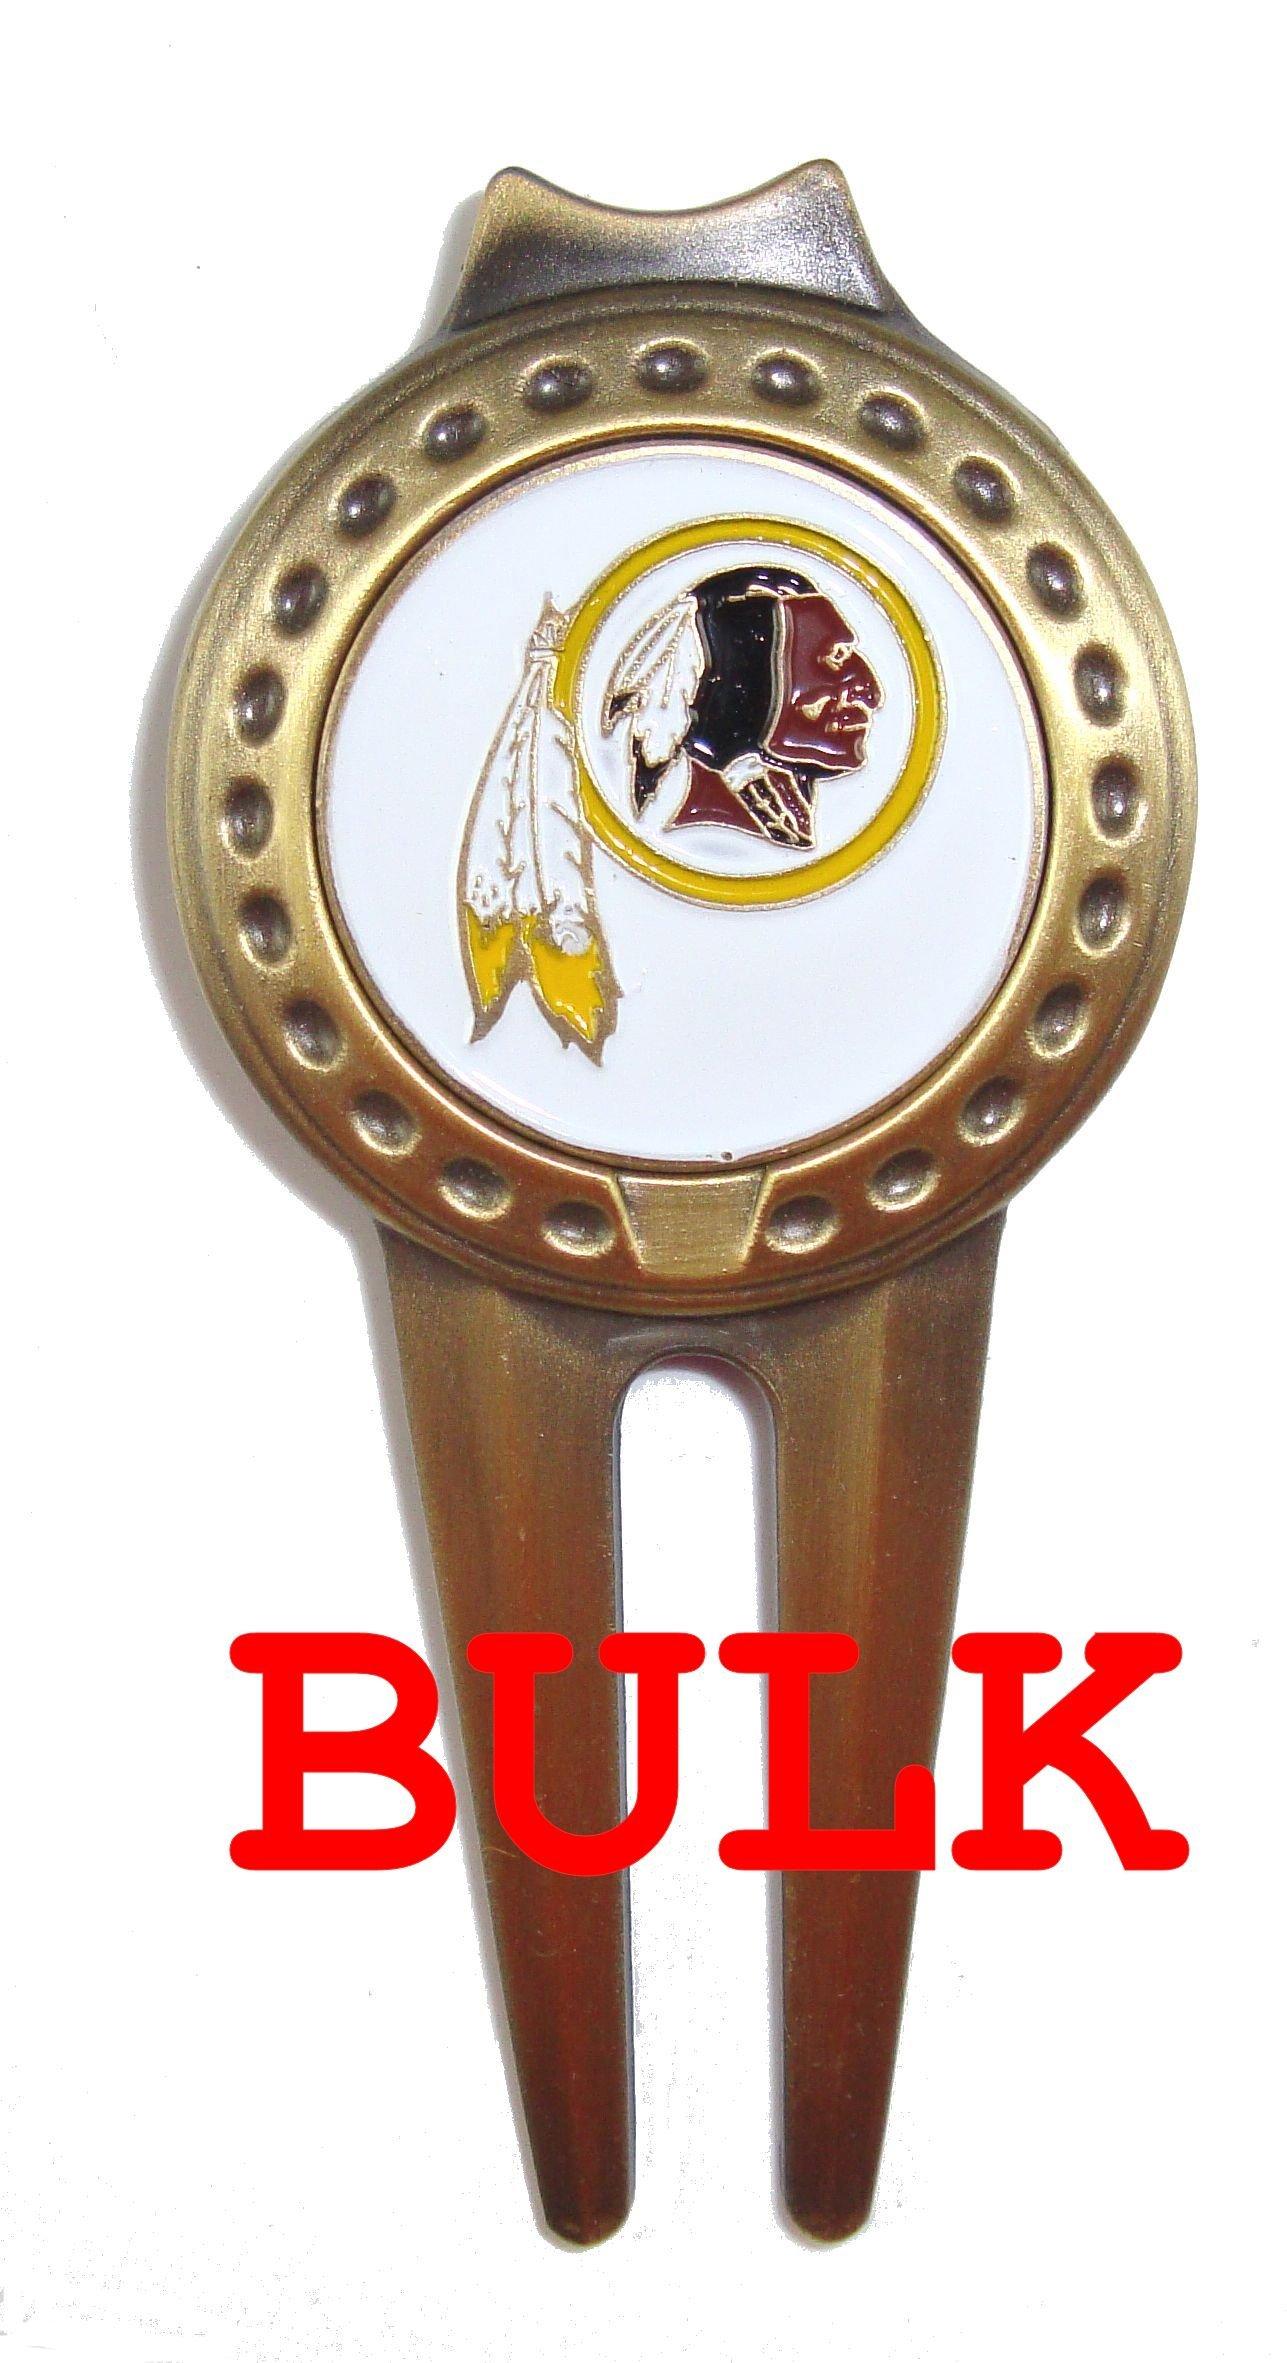 Bulk: 100 Washington Redskins Divot Tools with Golf Ball Markers